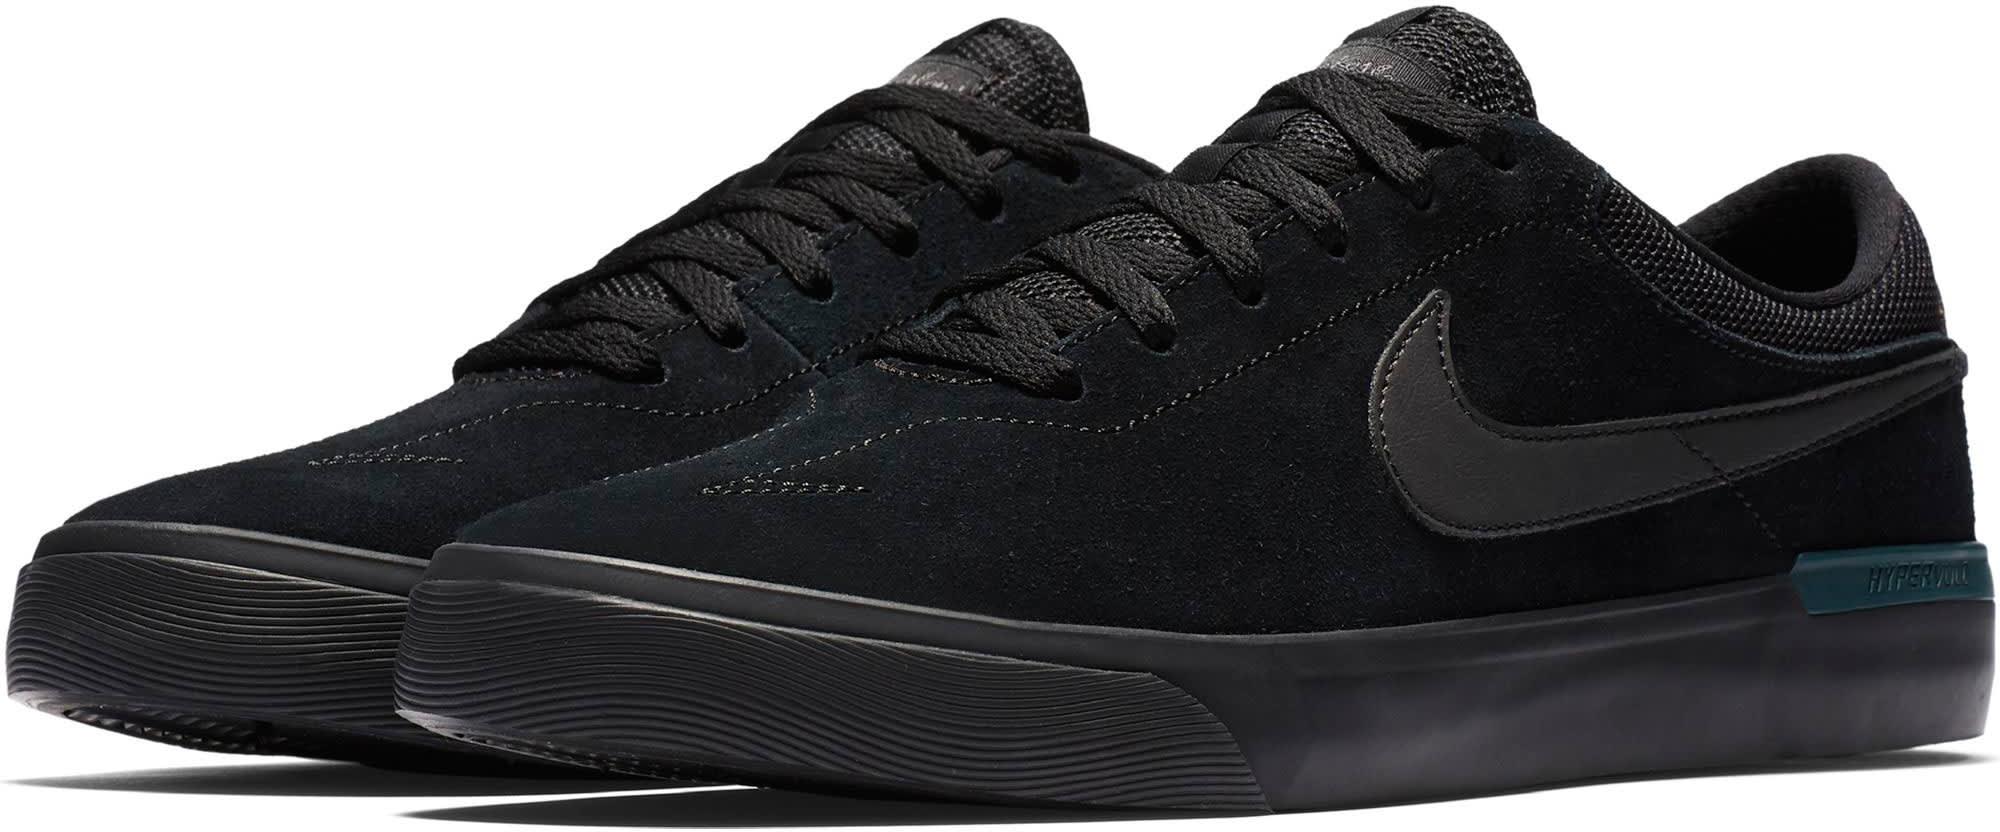 46f20afe541 Nike SB Koston Hypervulc Skate Shoes - thumbnail 3